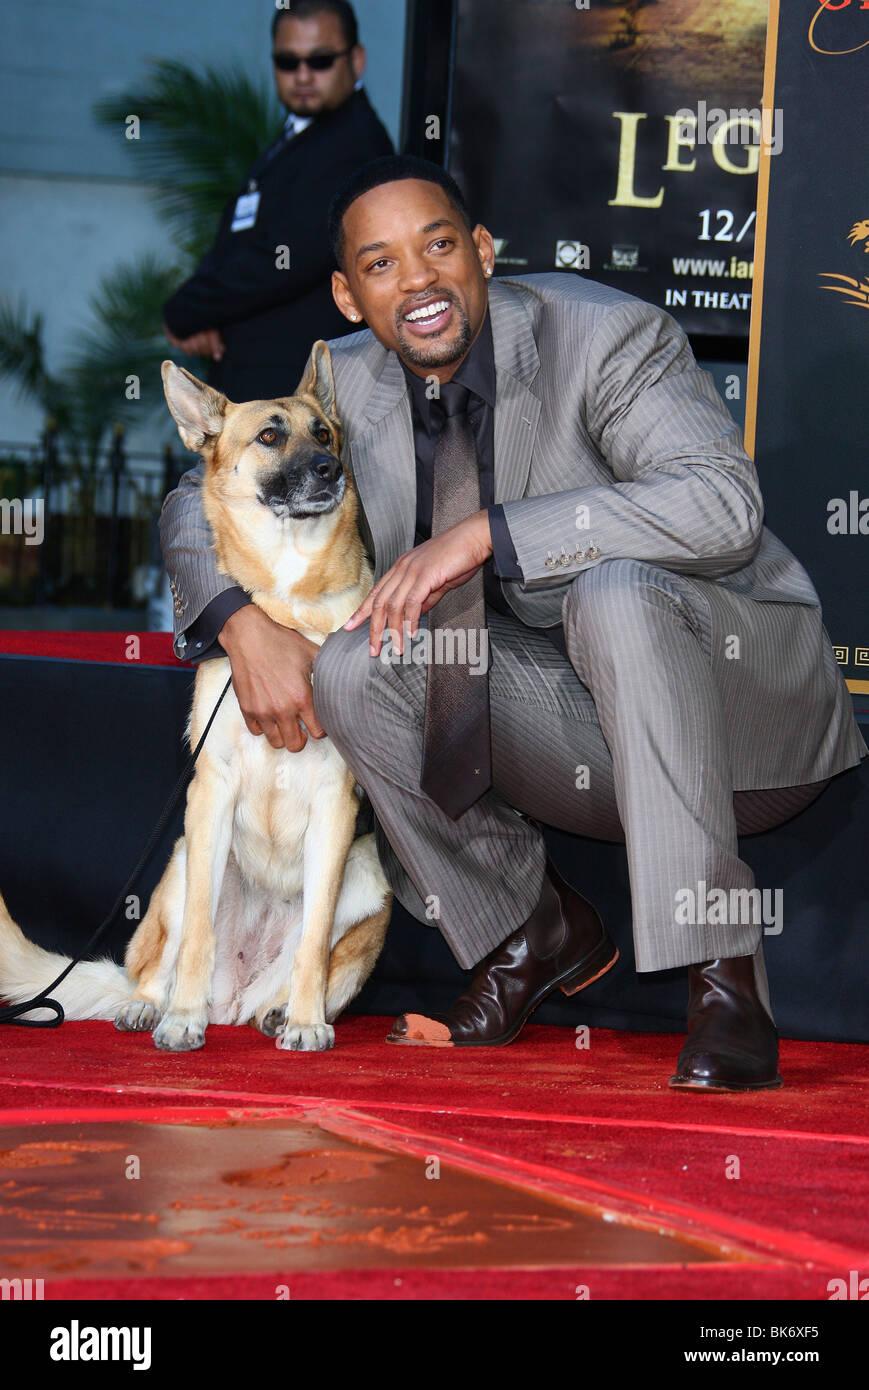 I Am Legend Puppy WILL SMITH & DOG F...